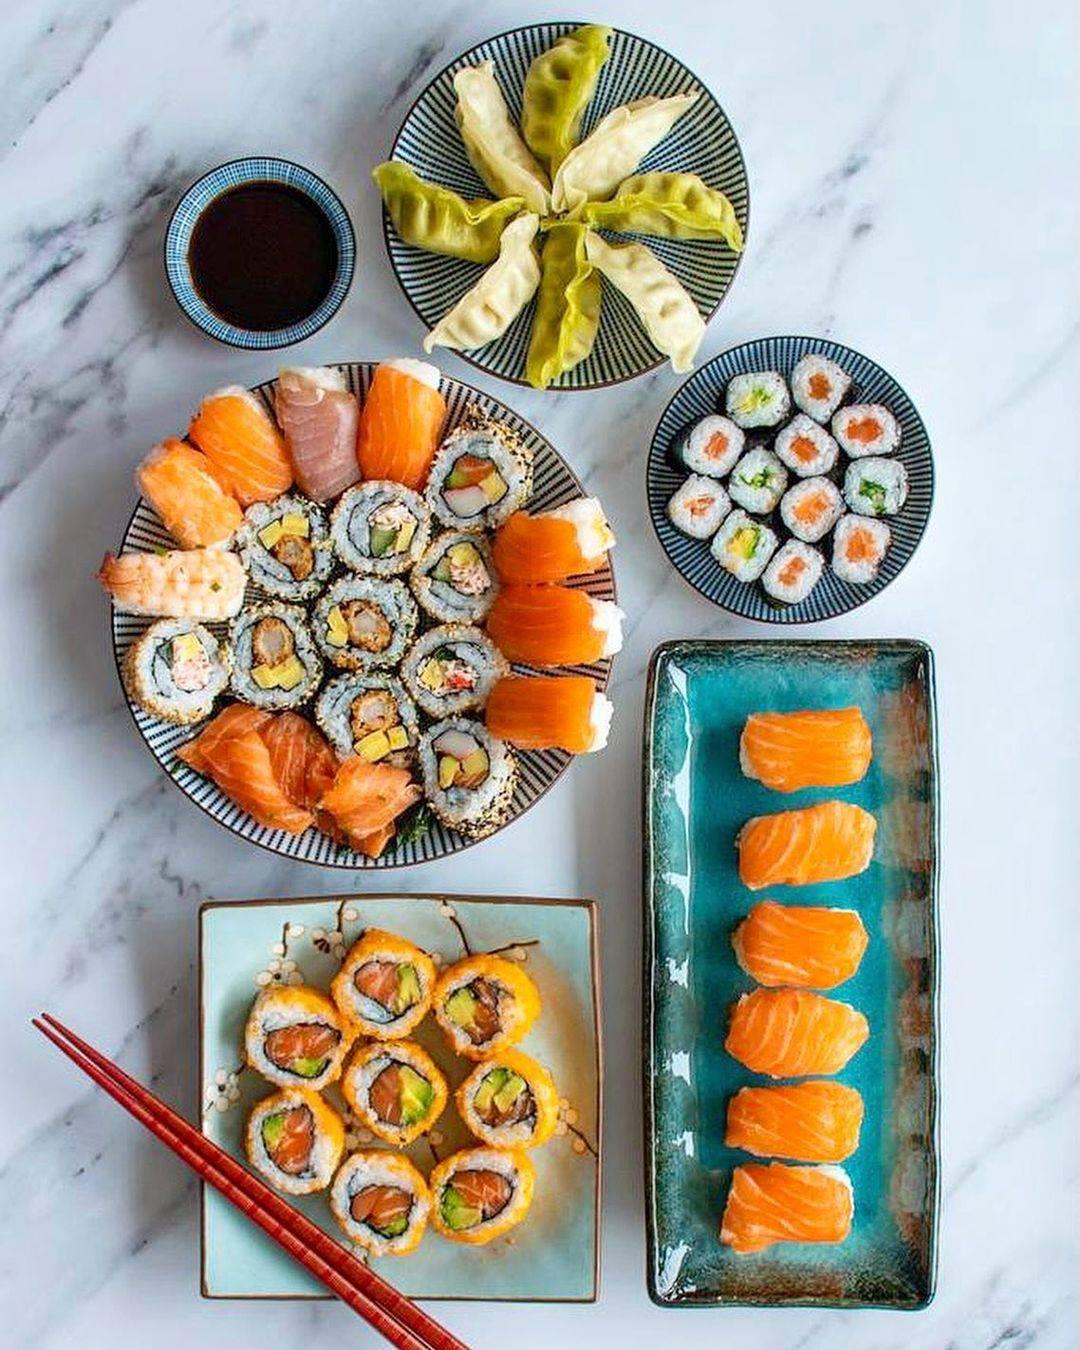 Wasabi Sushi & Bento - Albion Street